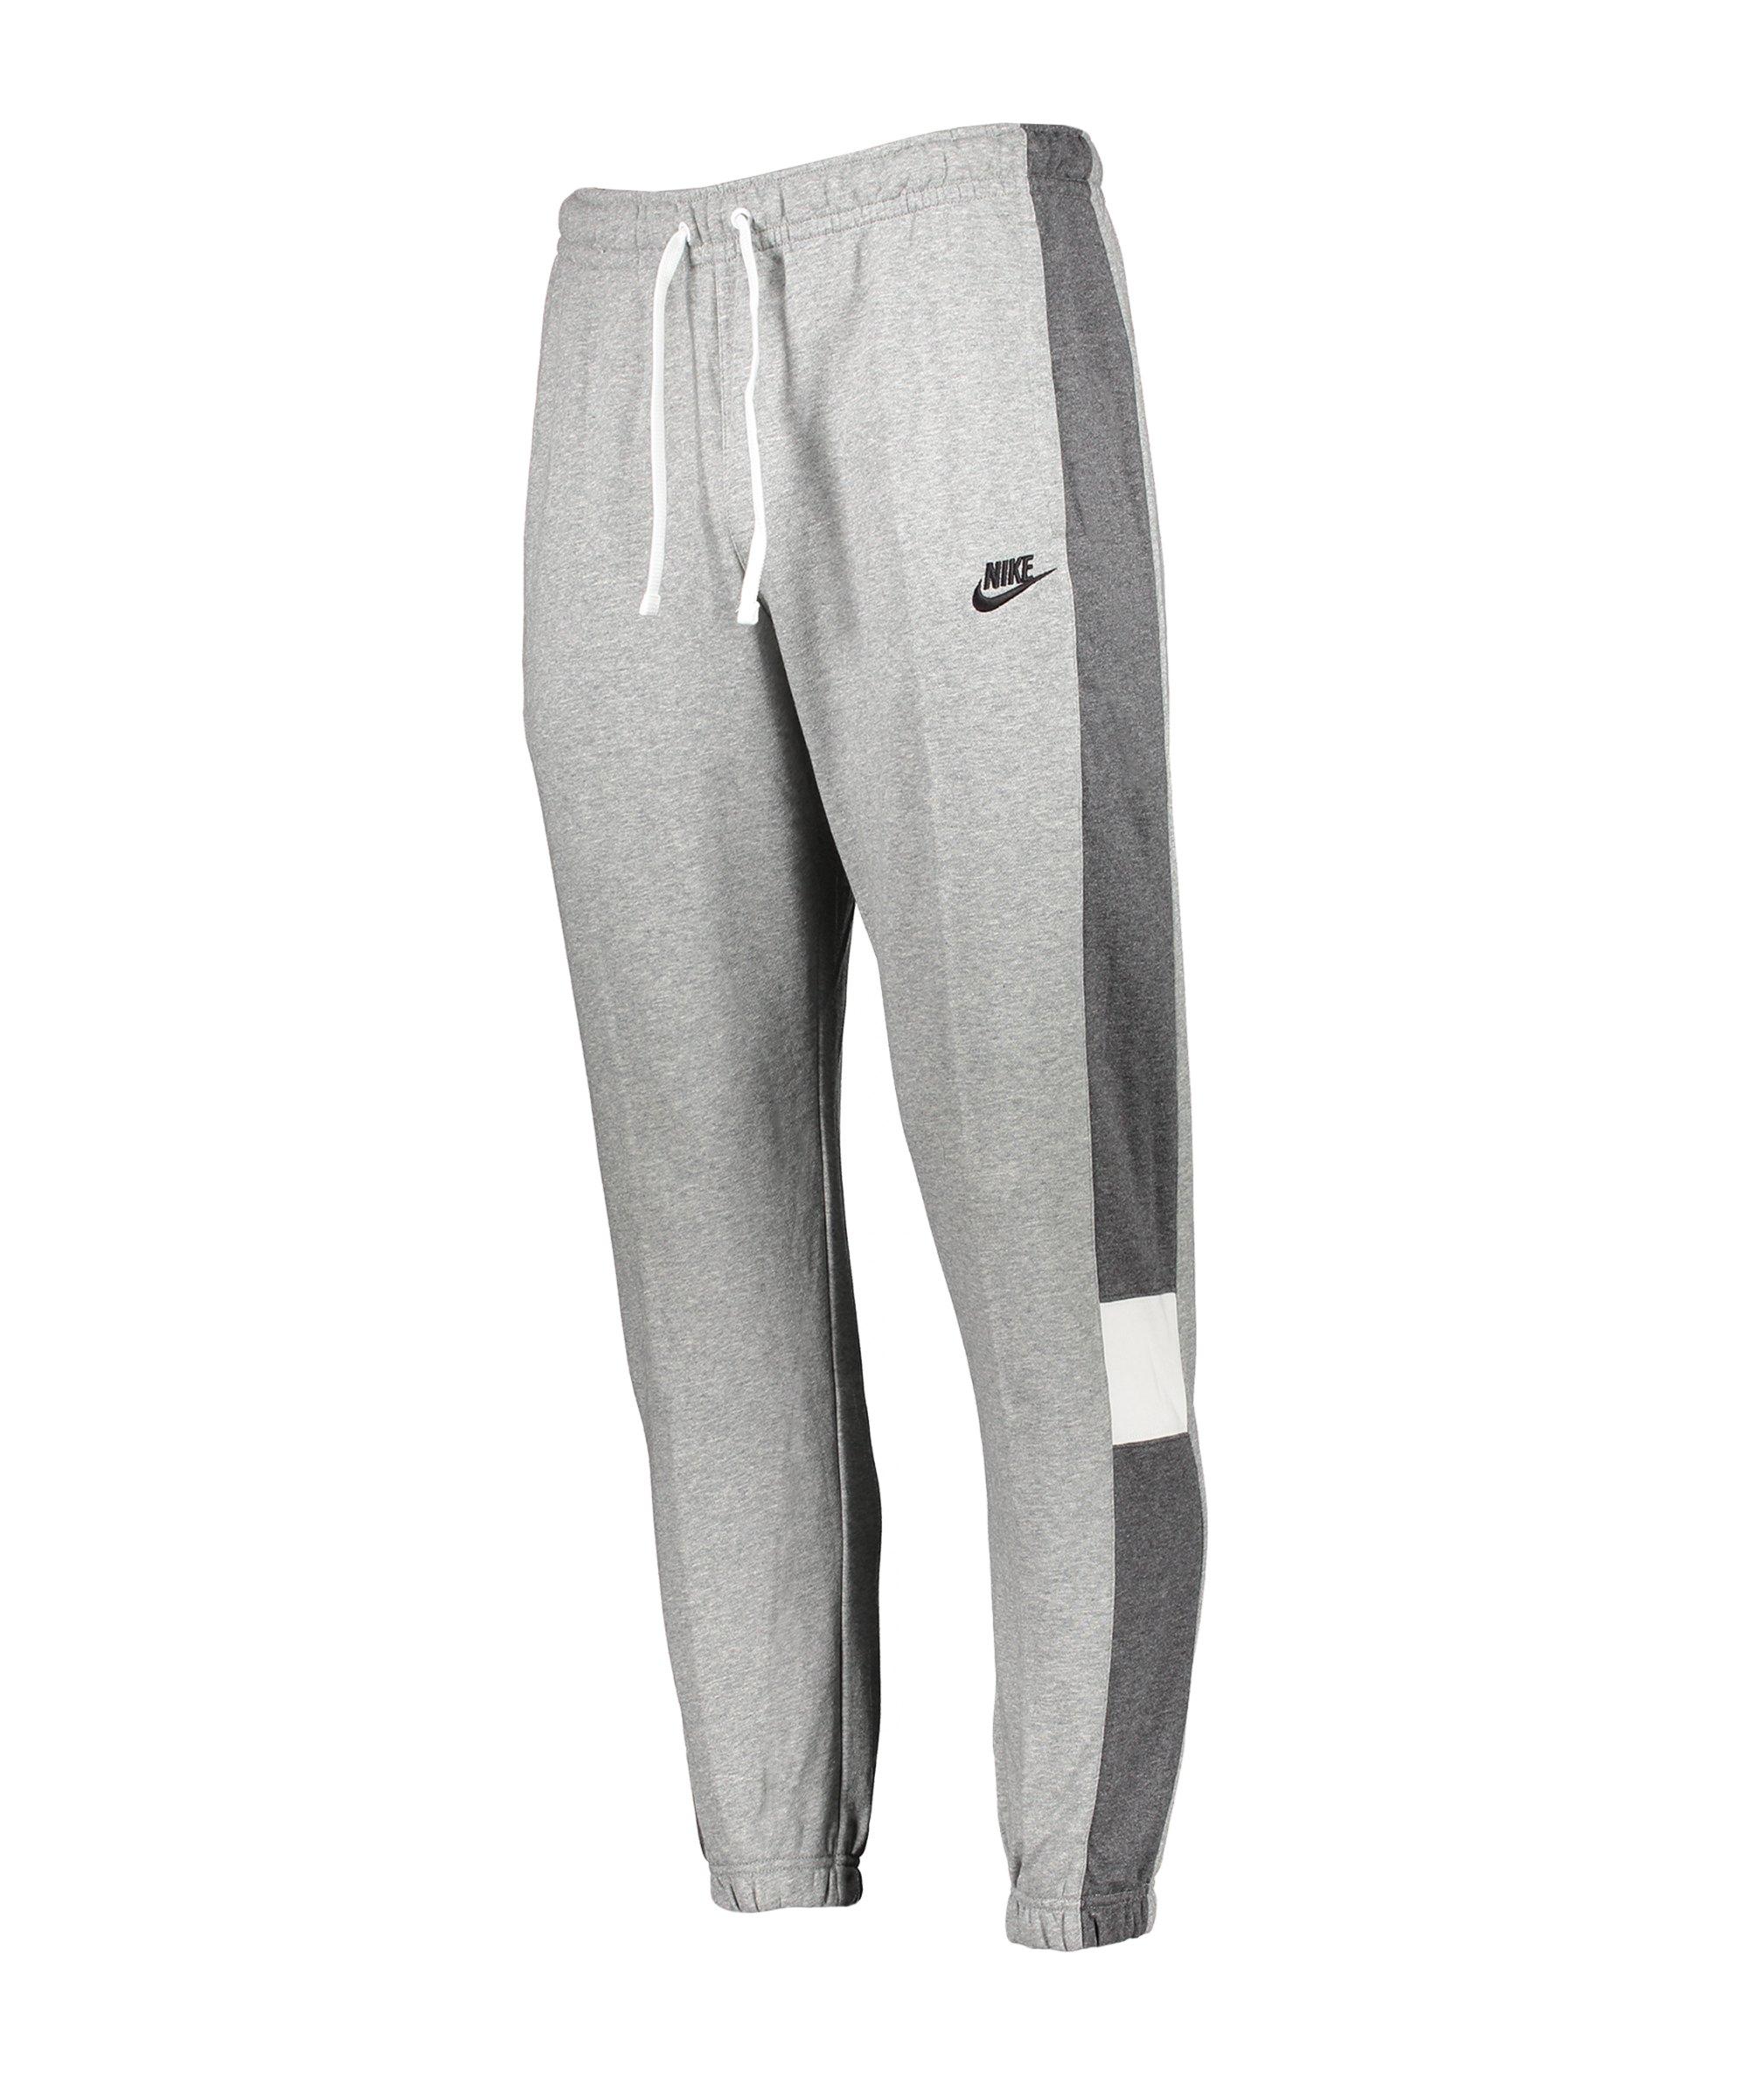 Nike Colorblock Jogginghose Grau F063 - grau